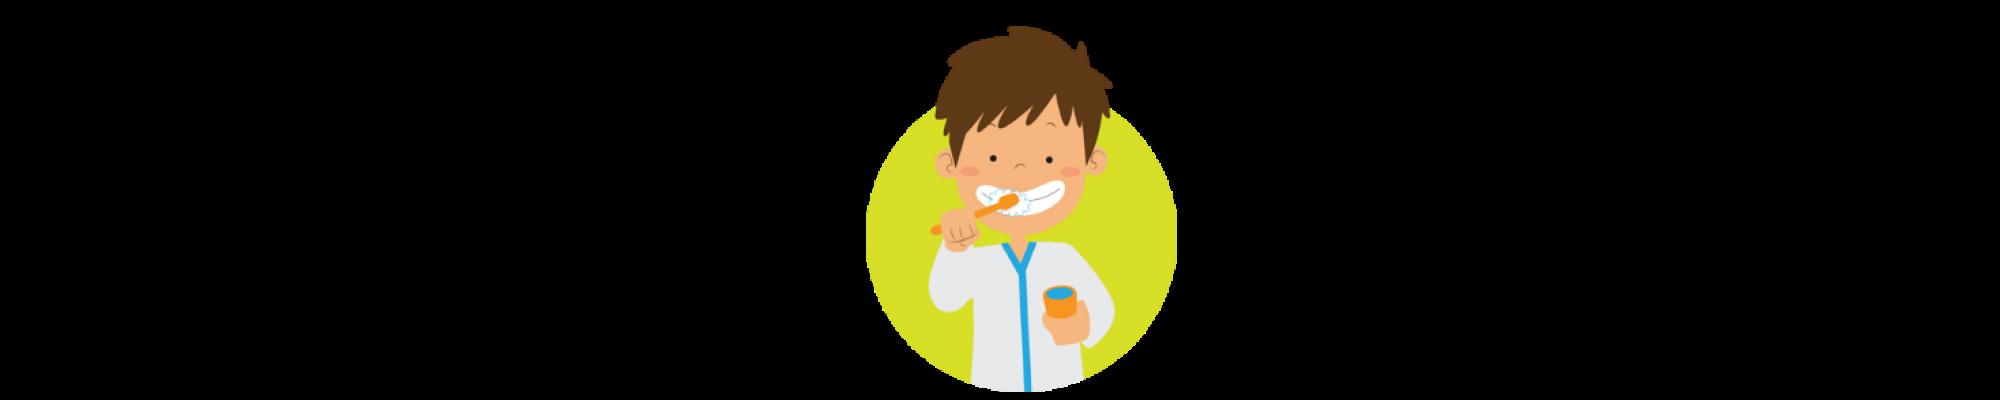 Dentistry millbrae ca dds. Dentist clipart pediatric dentist